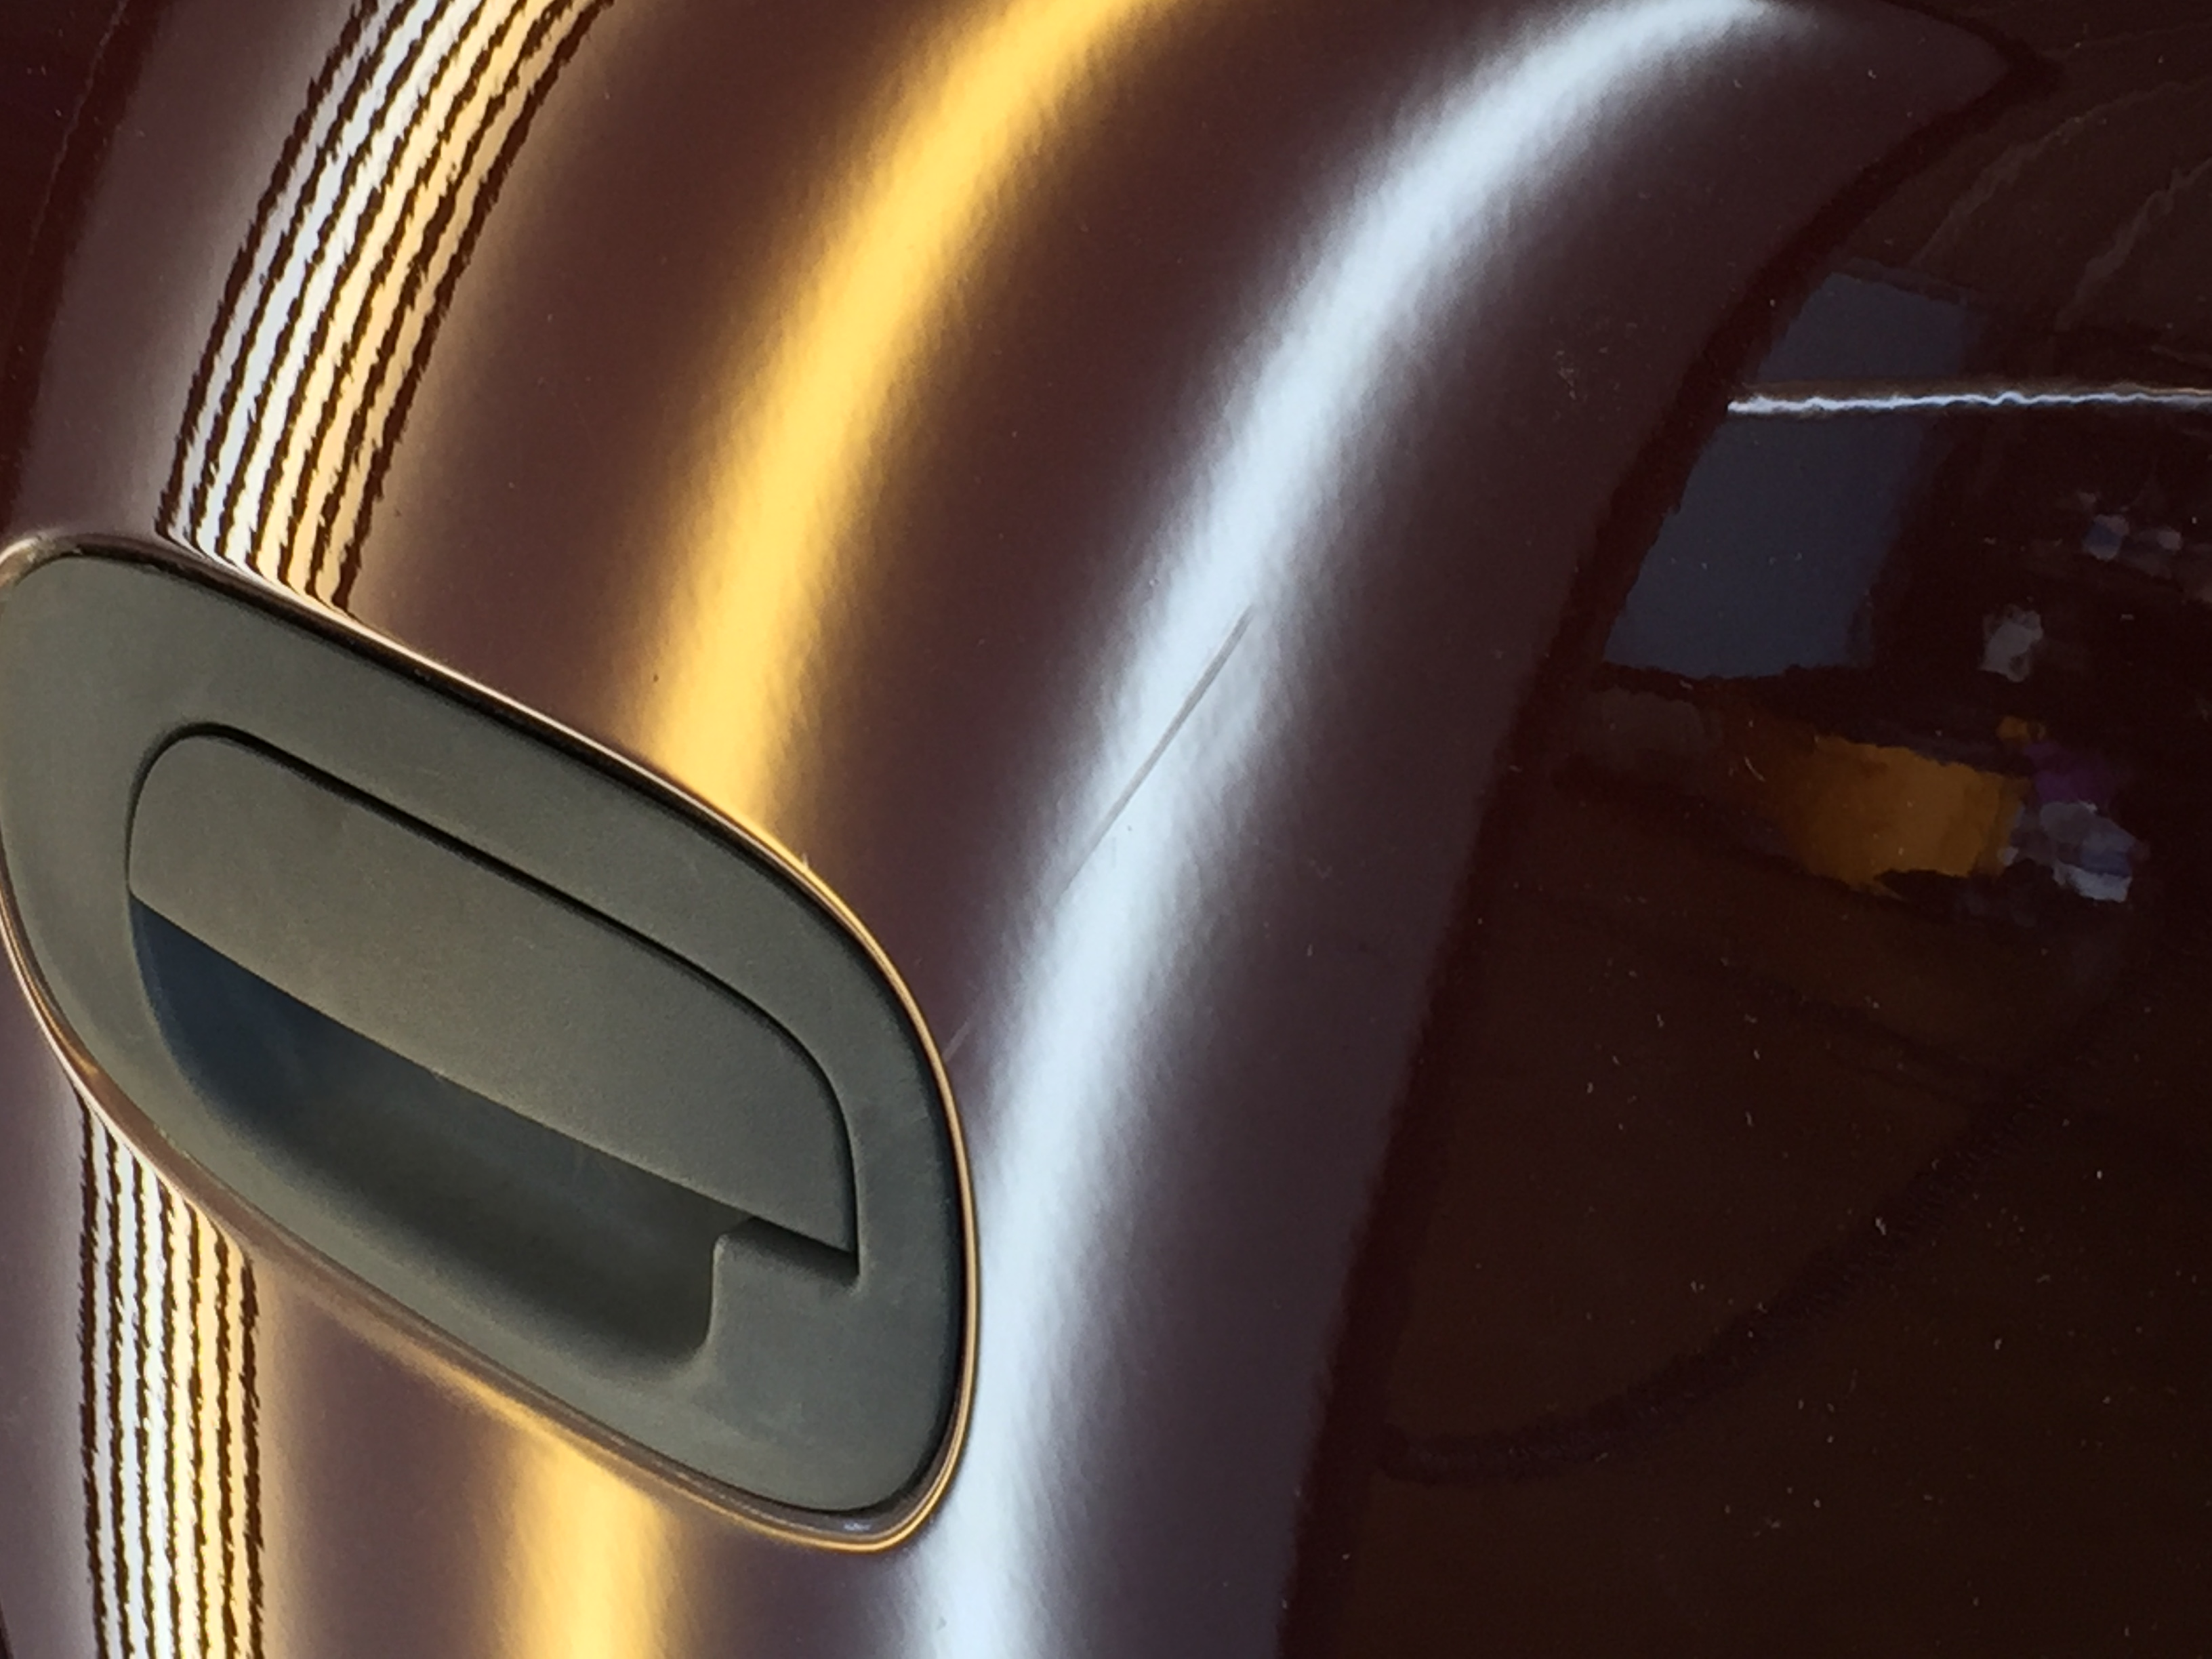 2004 Dodge Dakota Dent Repair in Springfield, IL, http://217dent.com dent was in the passenger rear door and repaird by Michael Bocek